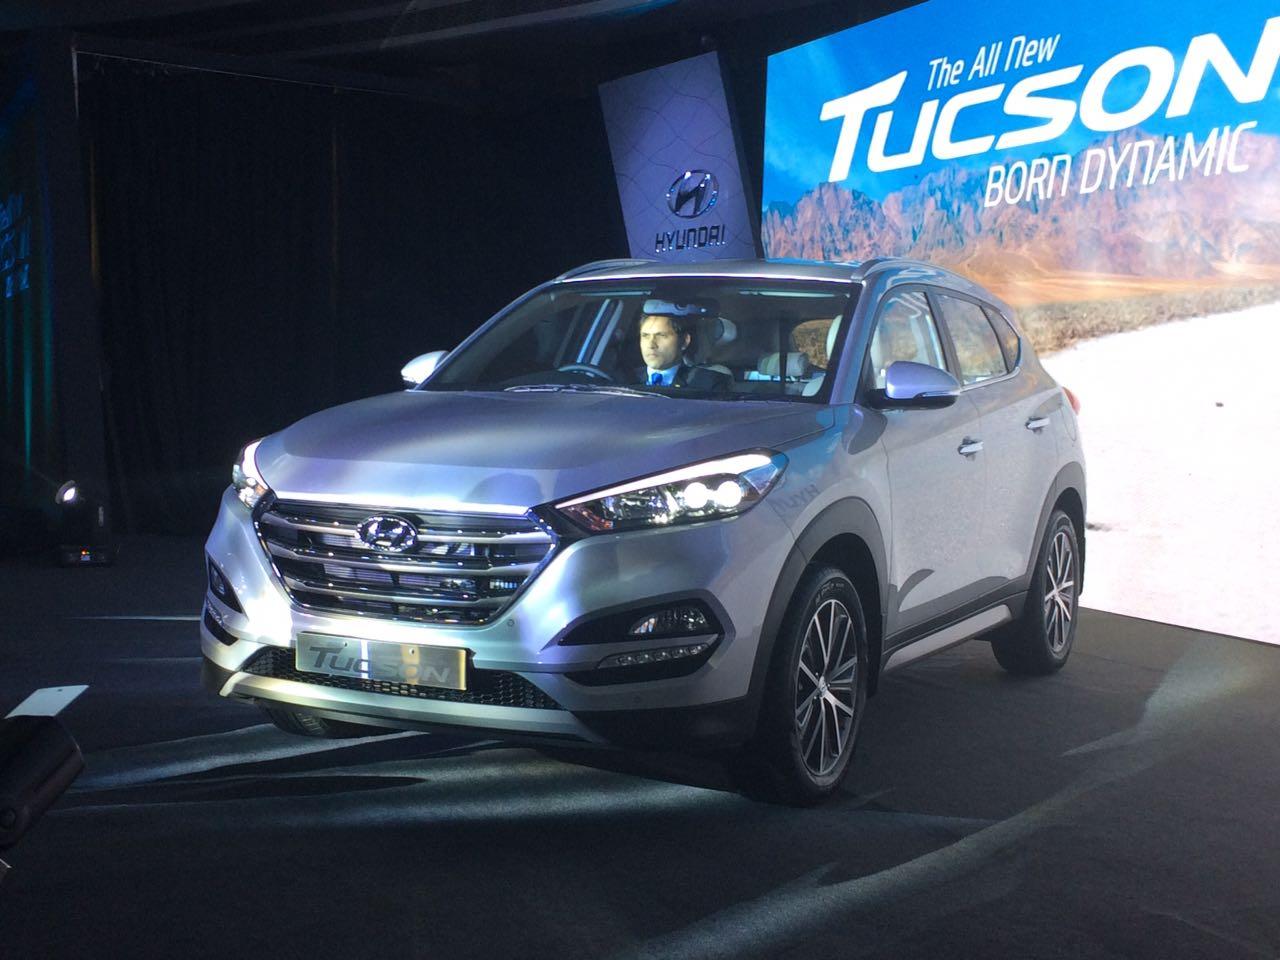 2016 Hyundai Tucson launched India